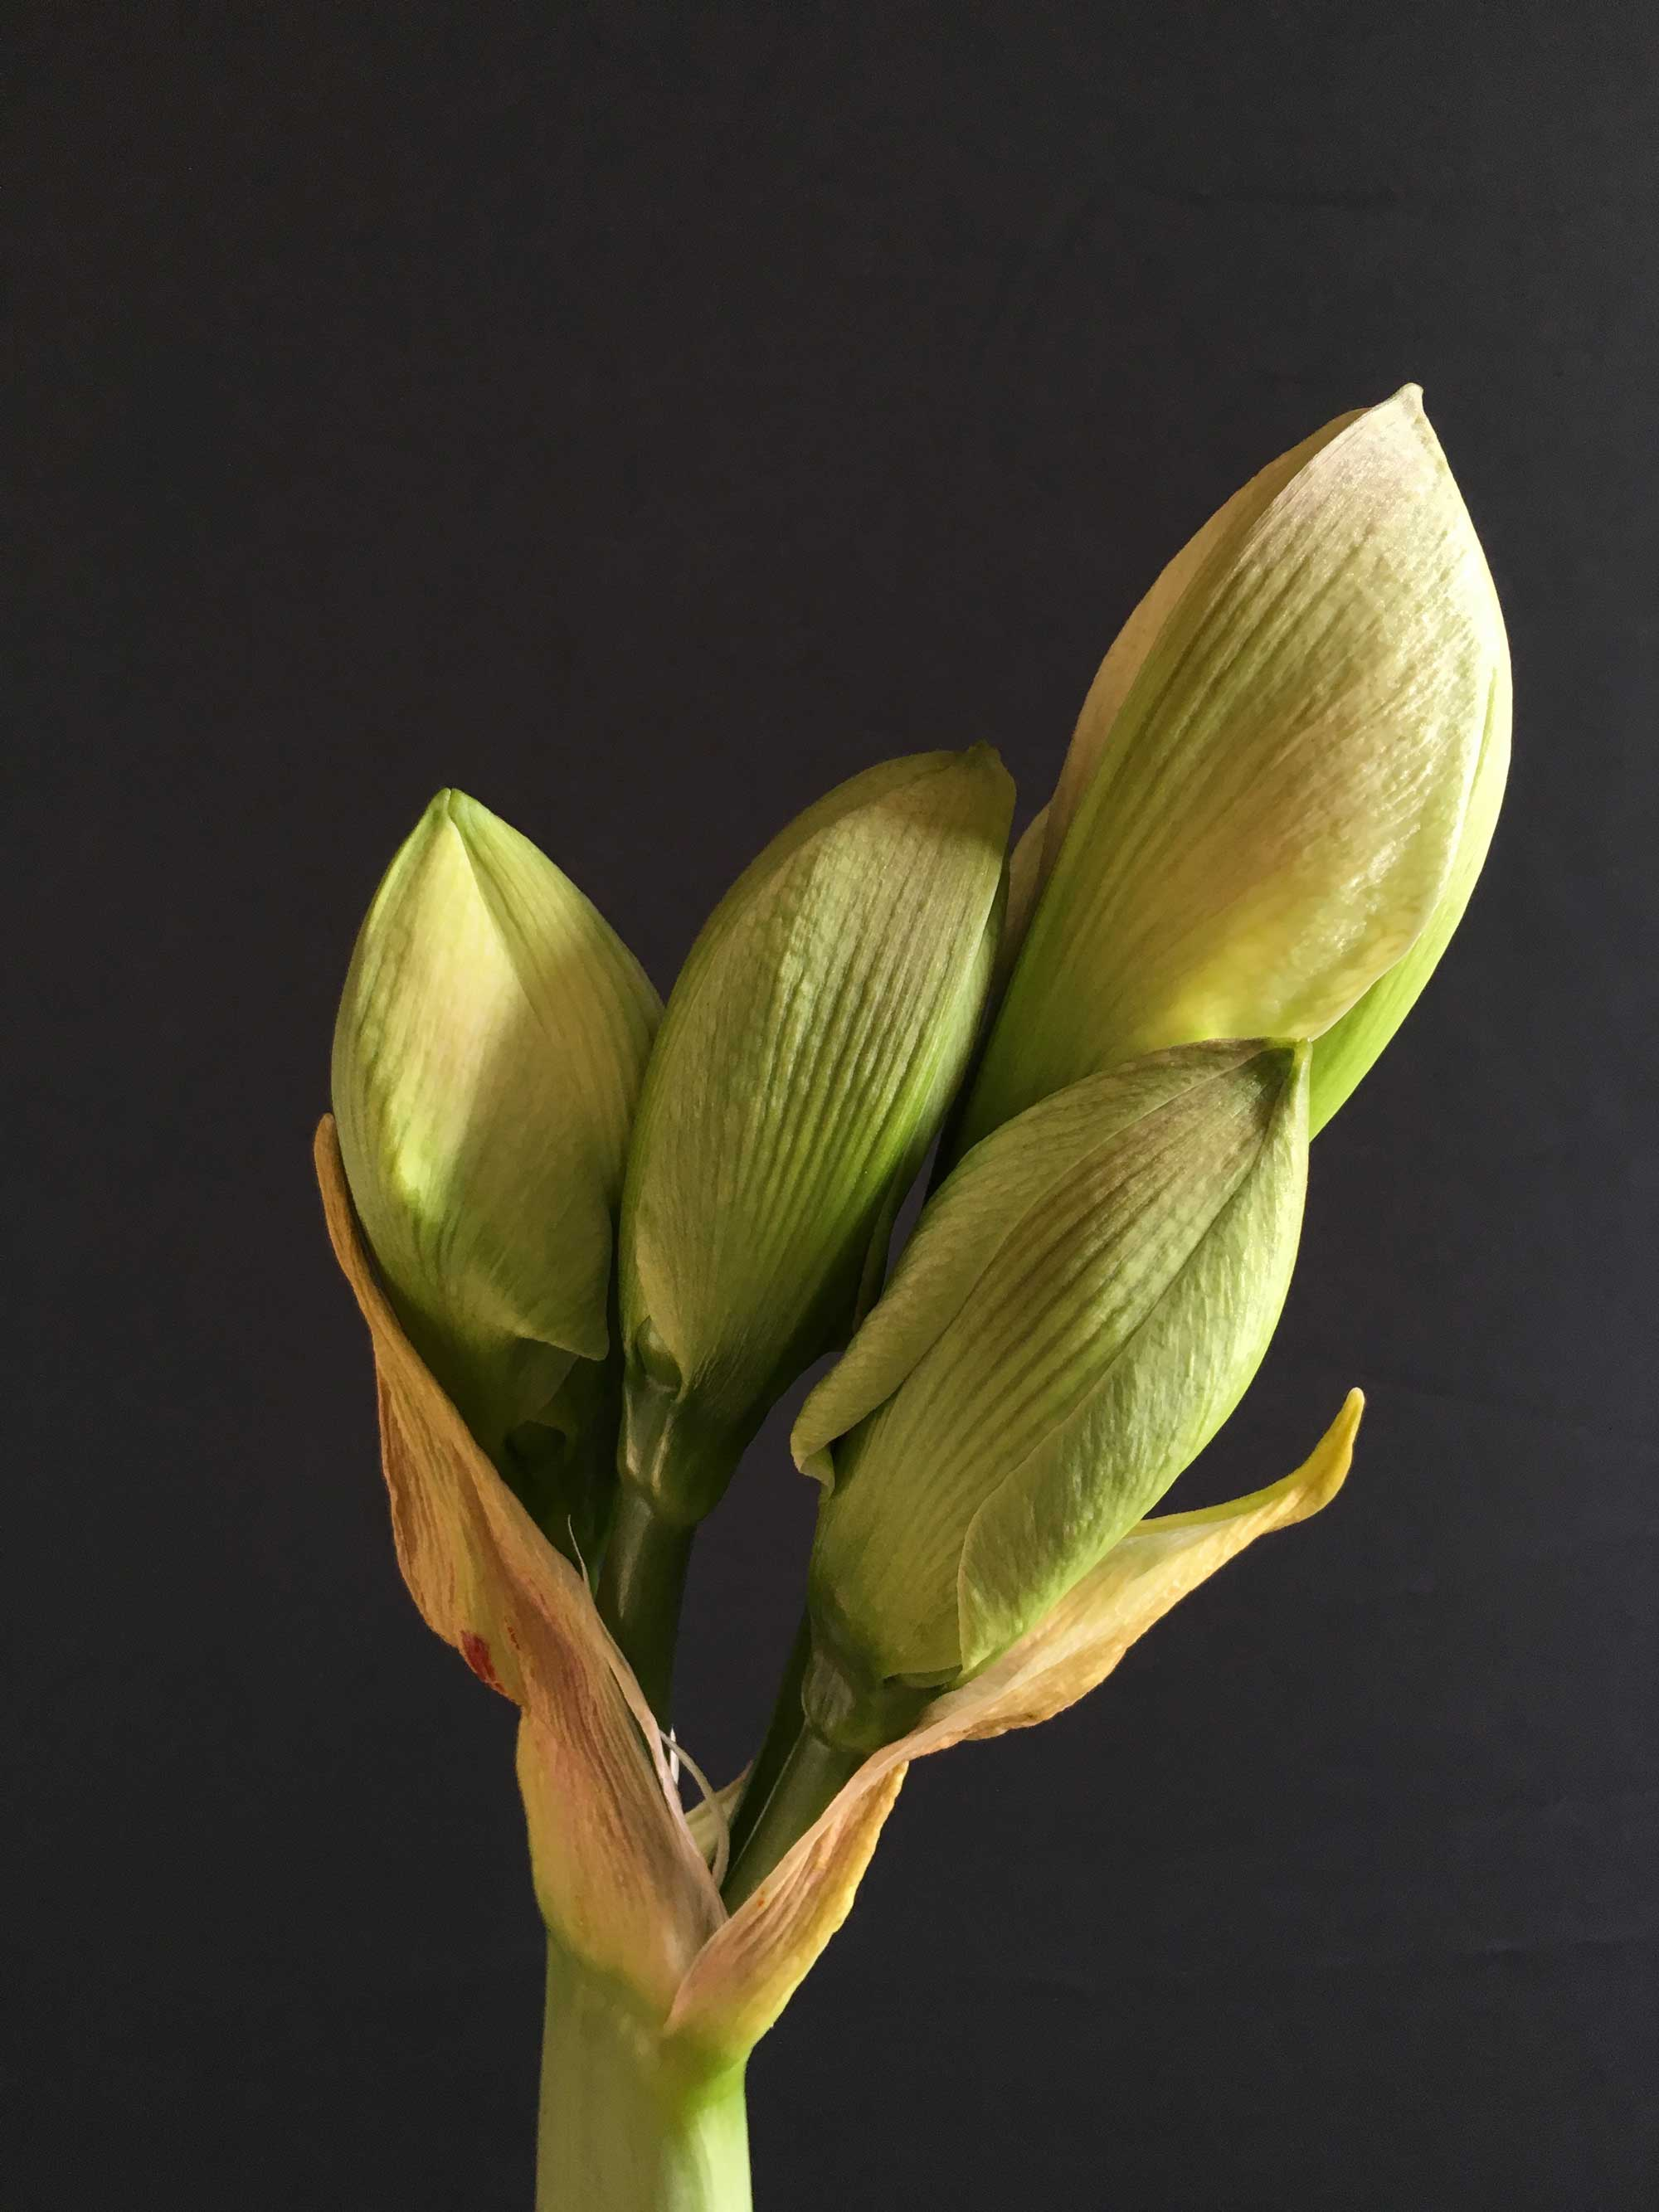 Amaryllis-Beauty-of-the-Bud-Longfield-Gardens4.jpg